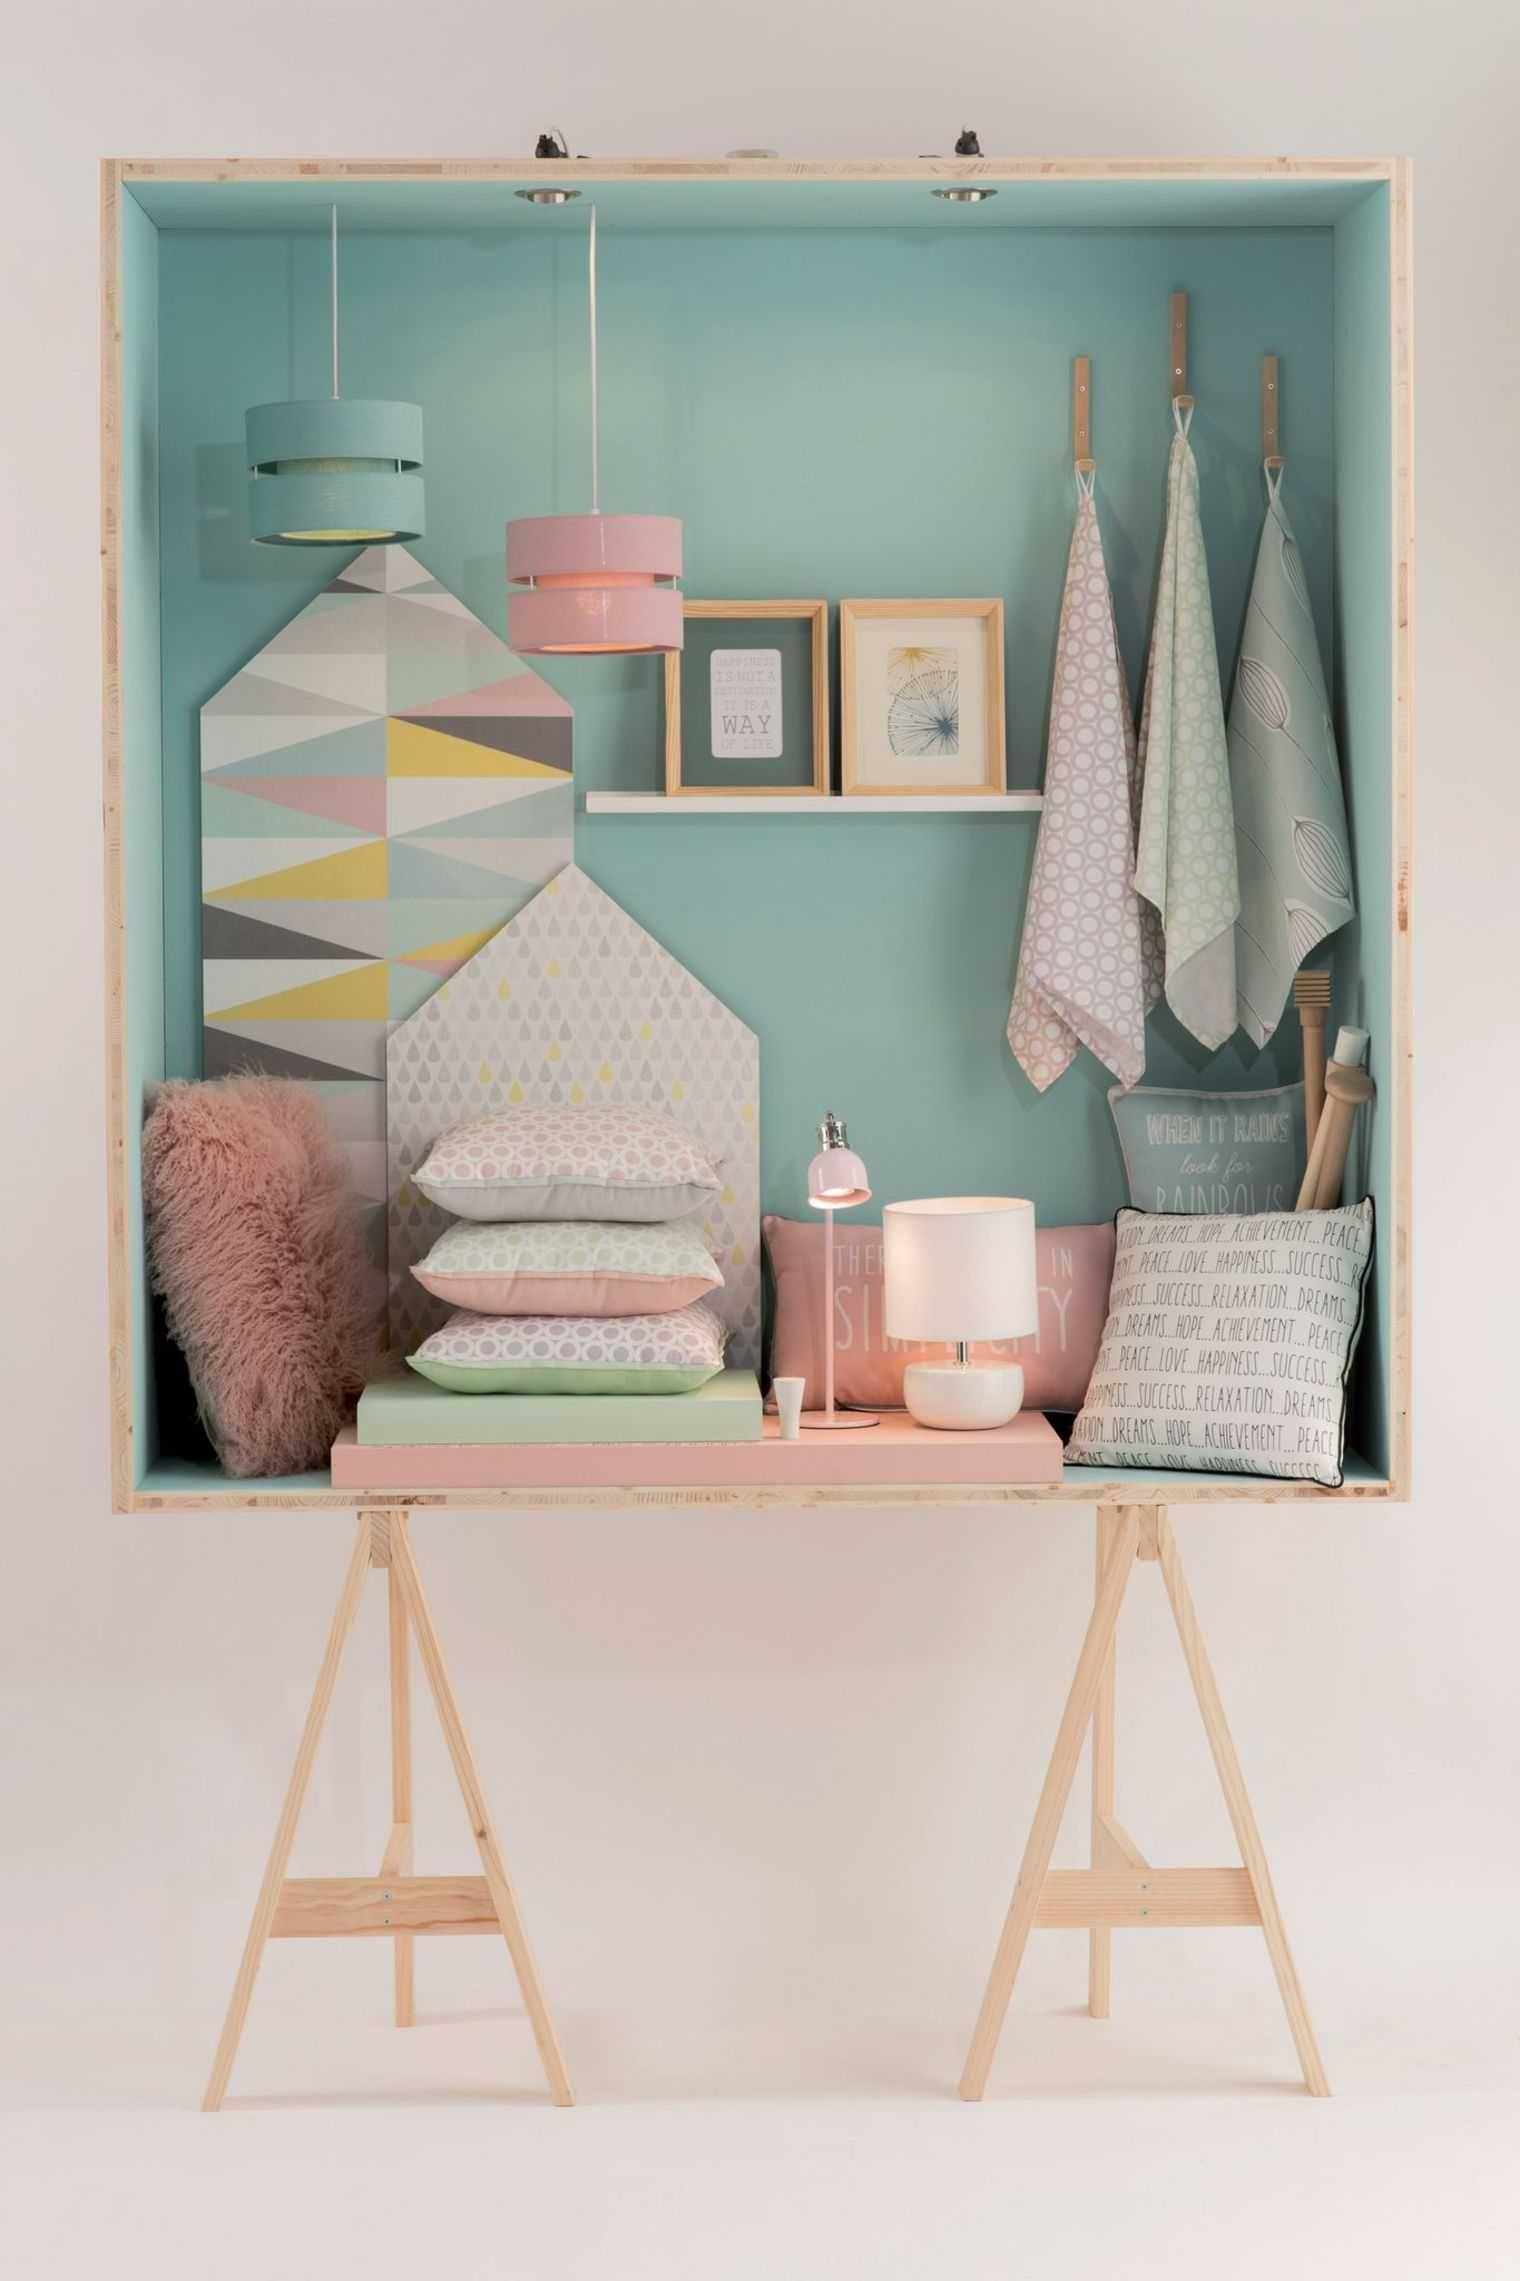 Charmant Chambre A Coucher: Chambre Deco Scandinave Best Chambre Scandinave Pastel  Ideas Galerie Avec Chambre Deco Scandinave Images